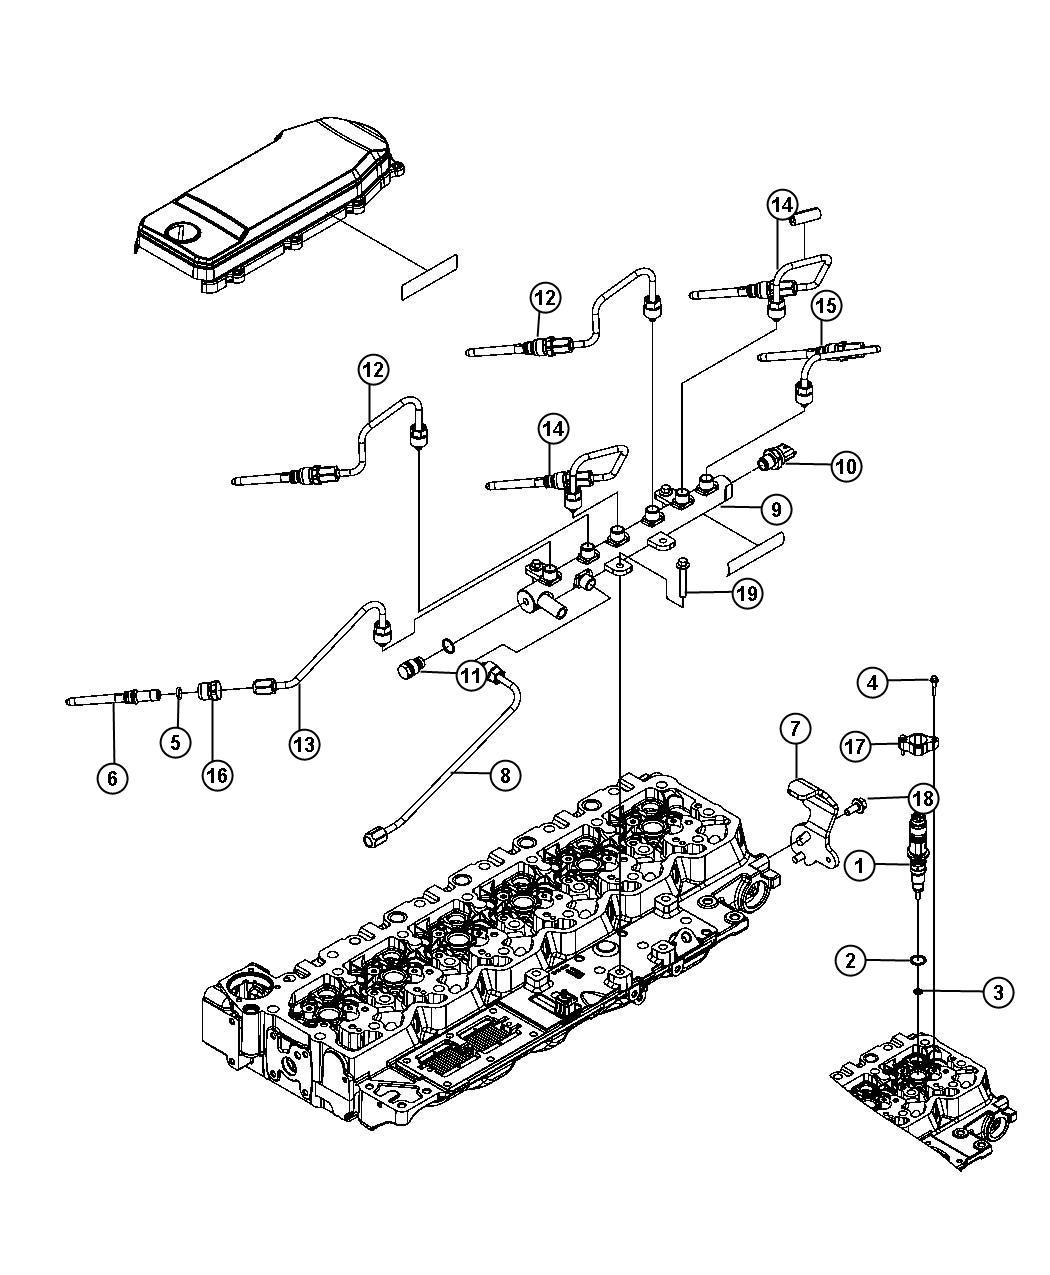 Dodge Ram Injector Fuel Emissions Plumbing